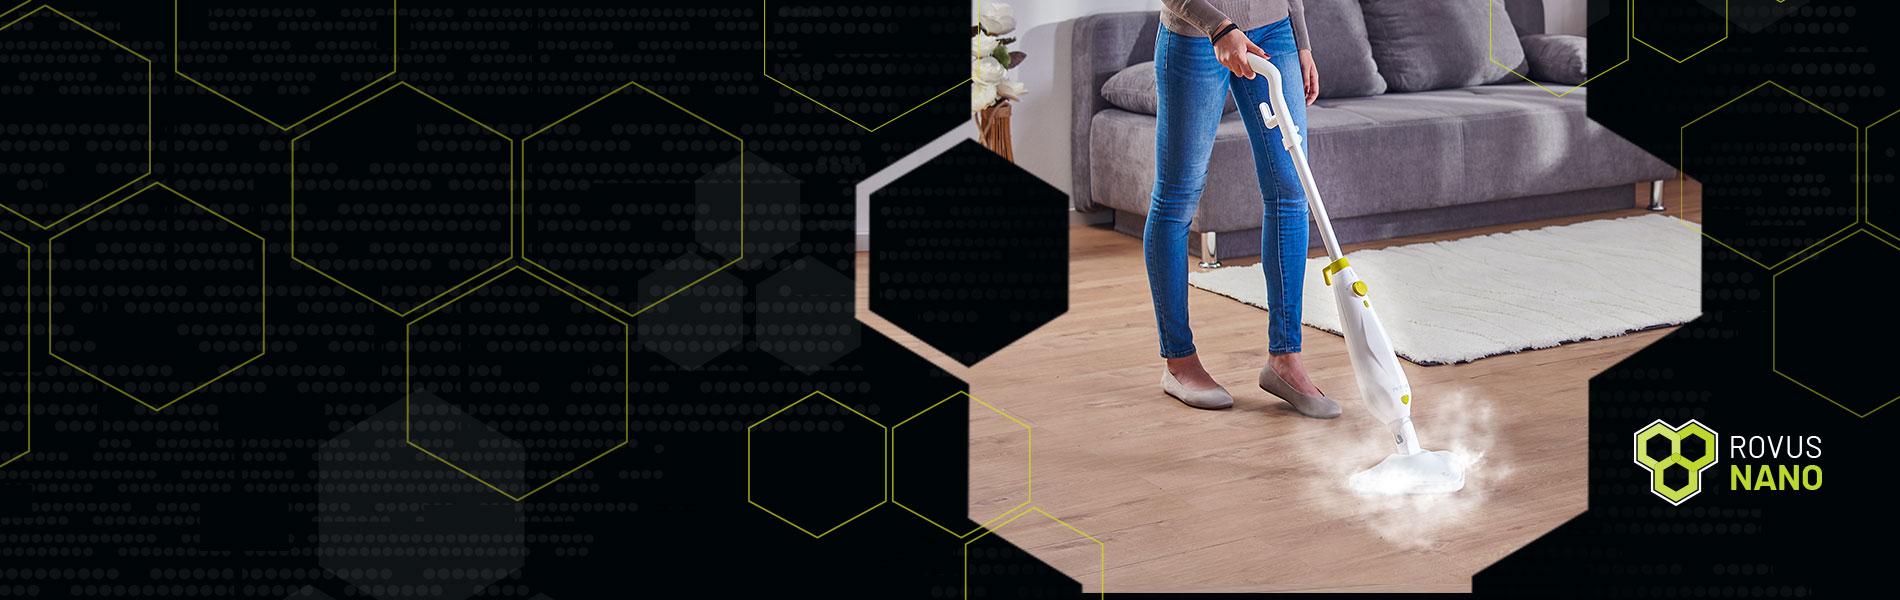 Nano Plus parni čistač za podove!